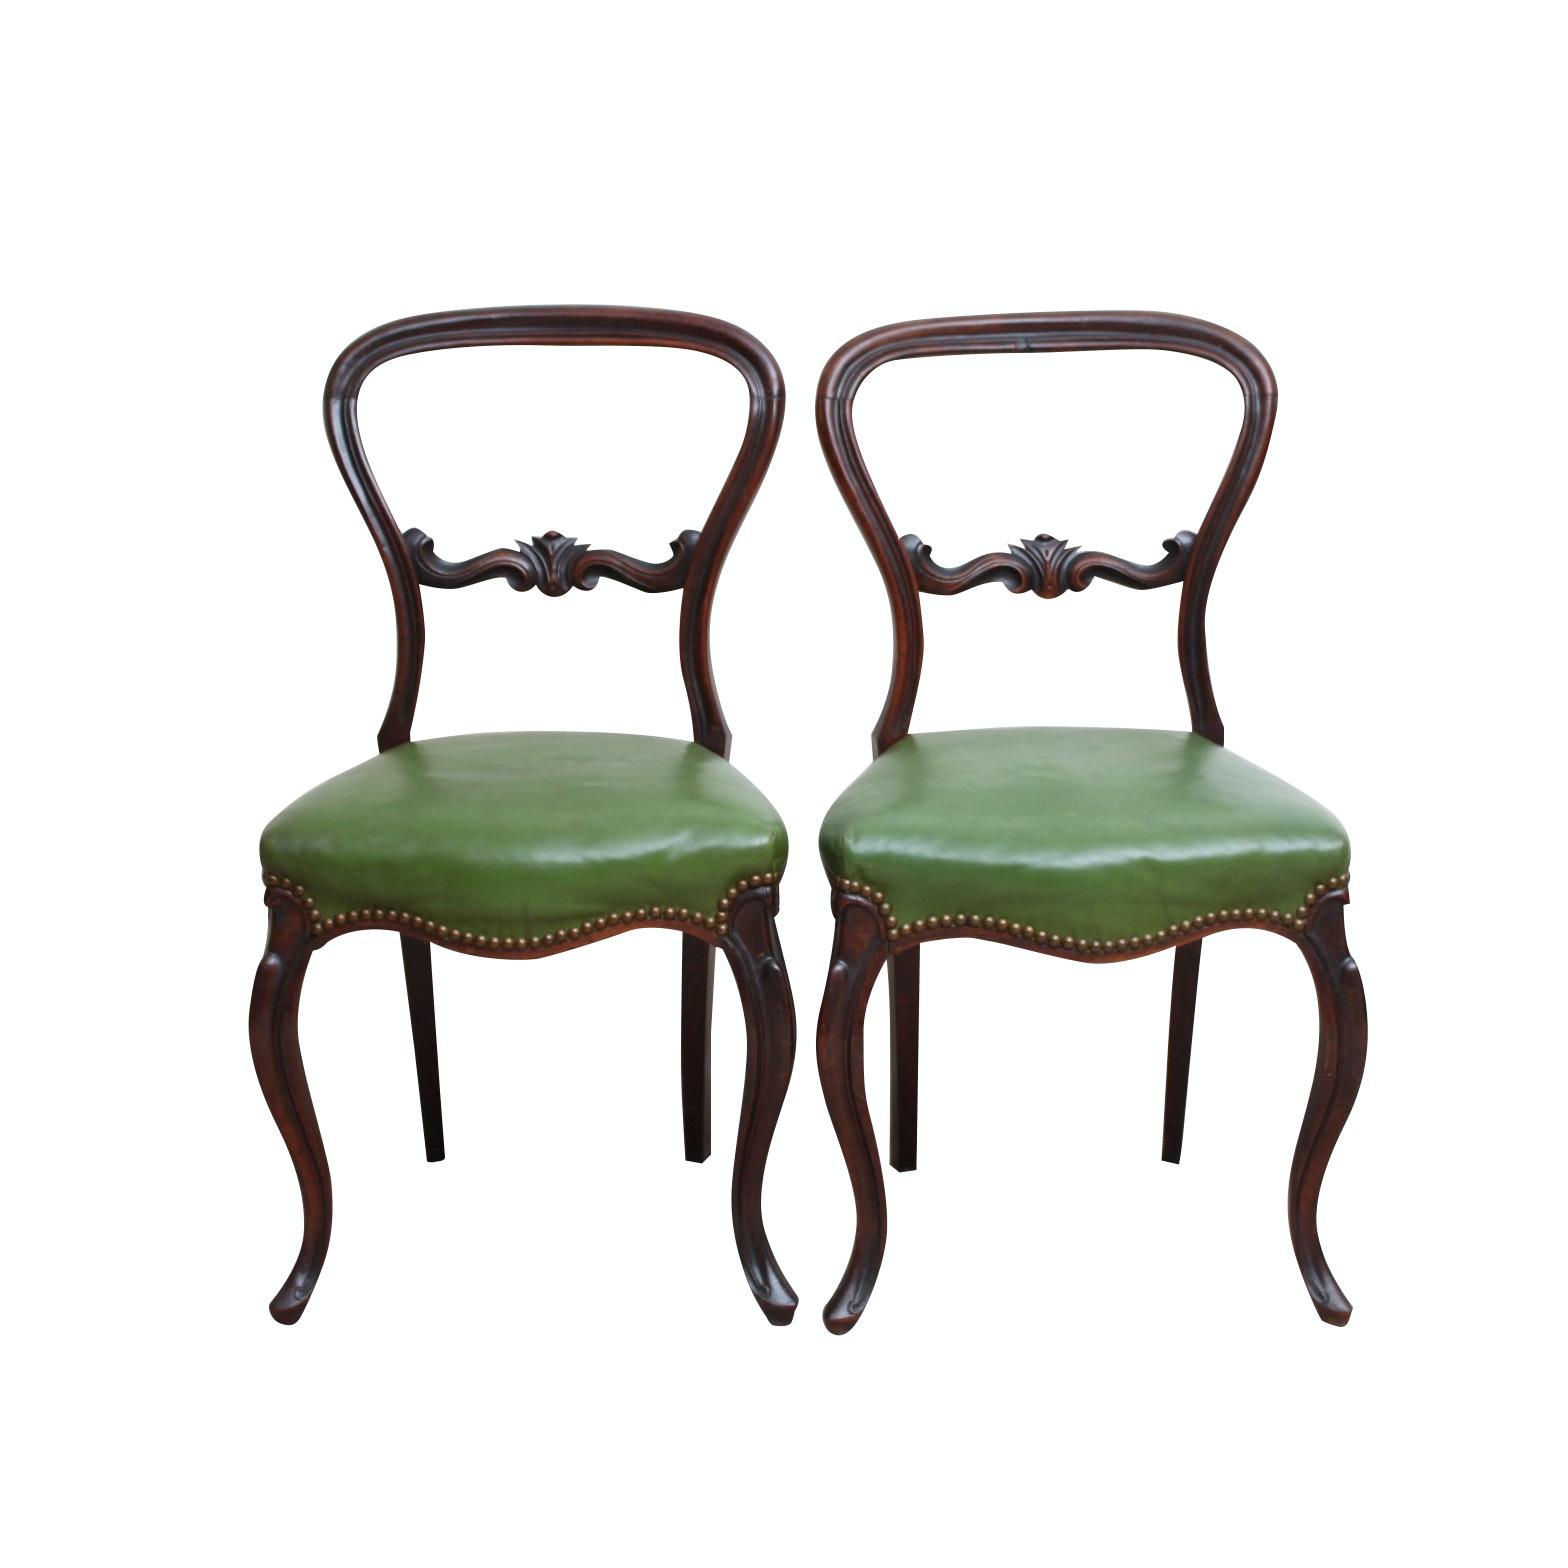 Victorian Mahogany Balloon Back Chairs